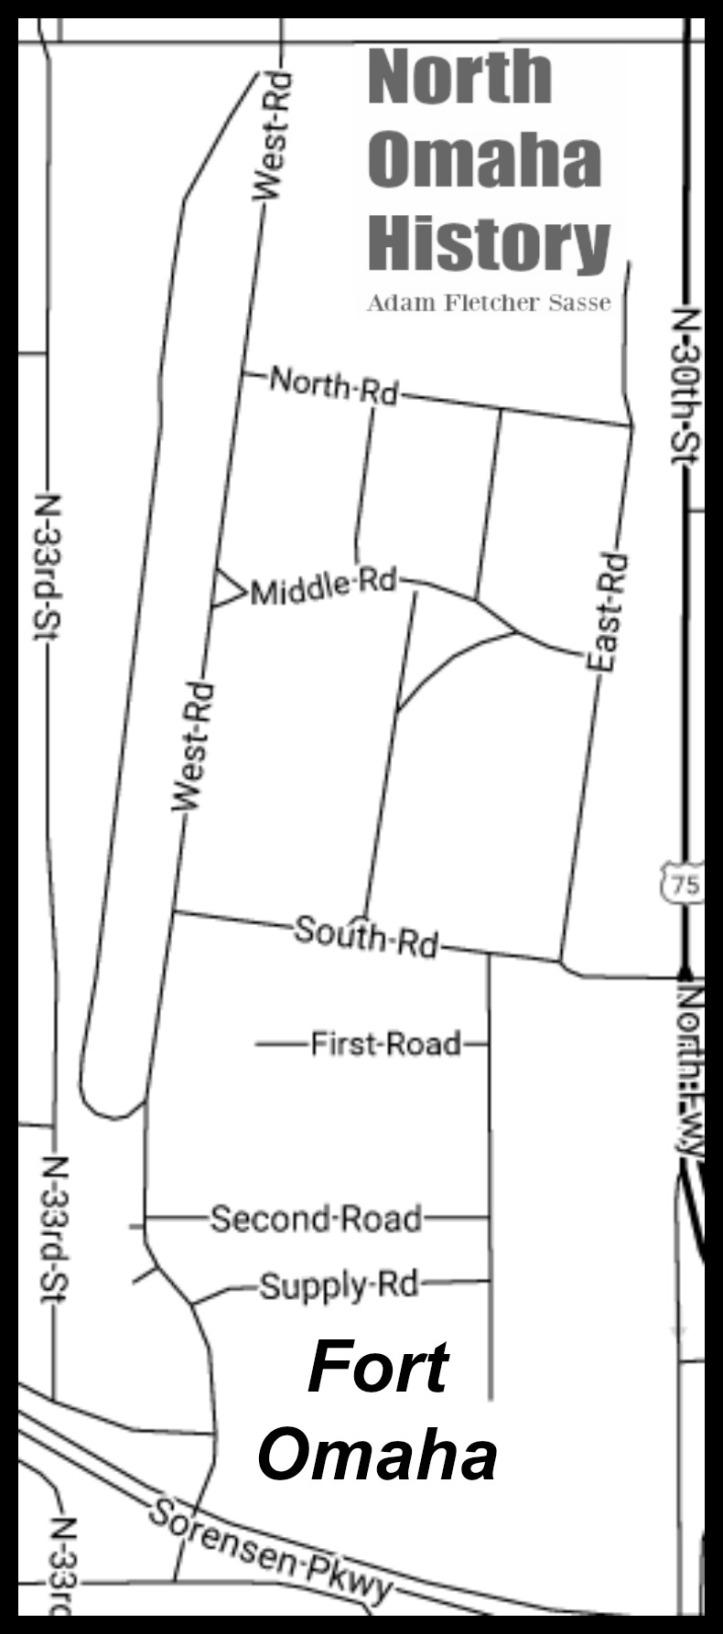 Map of Fort Omaha, North Omaha, Nebraska